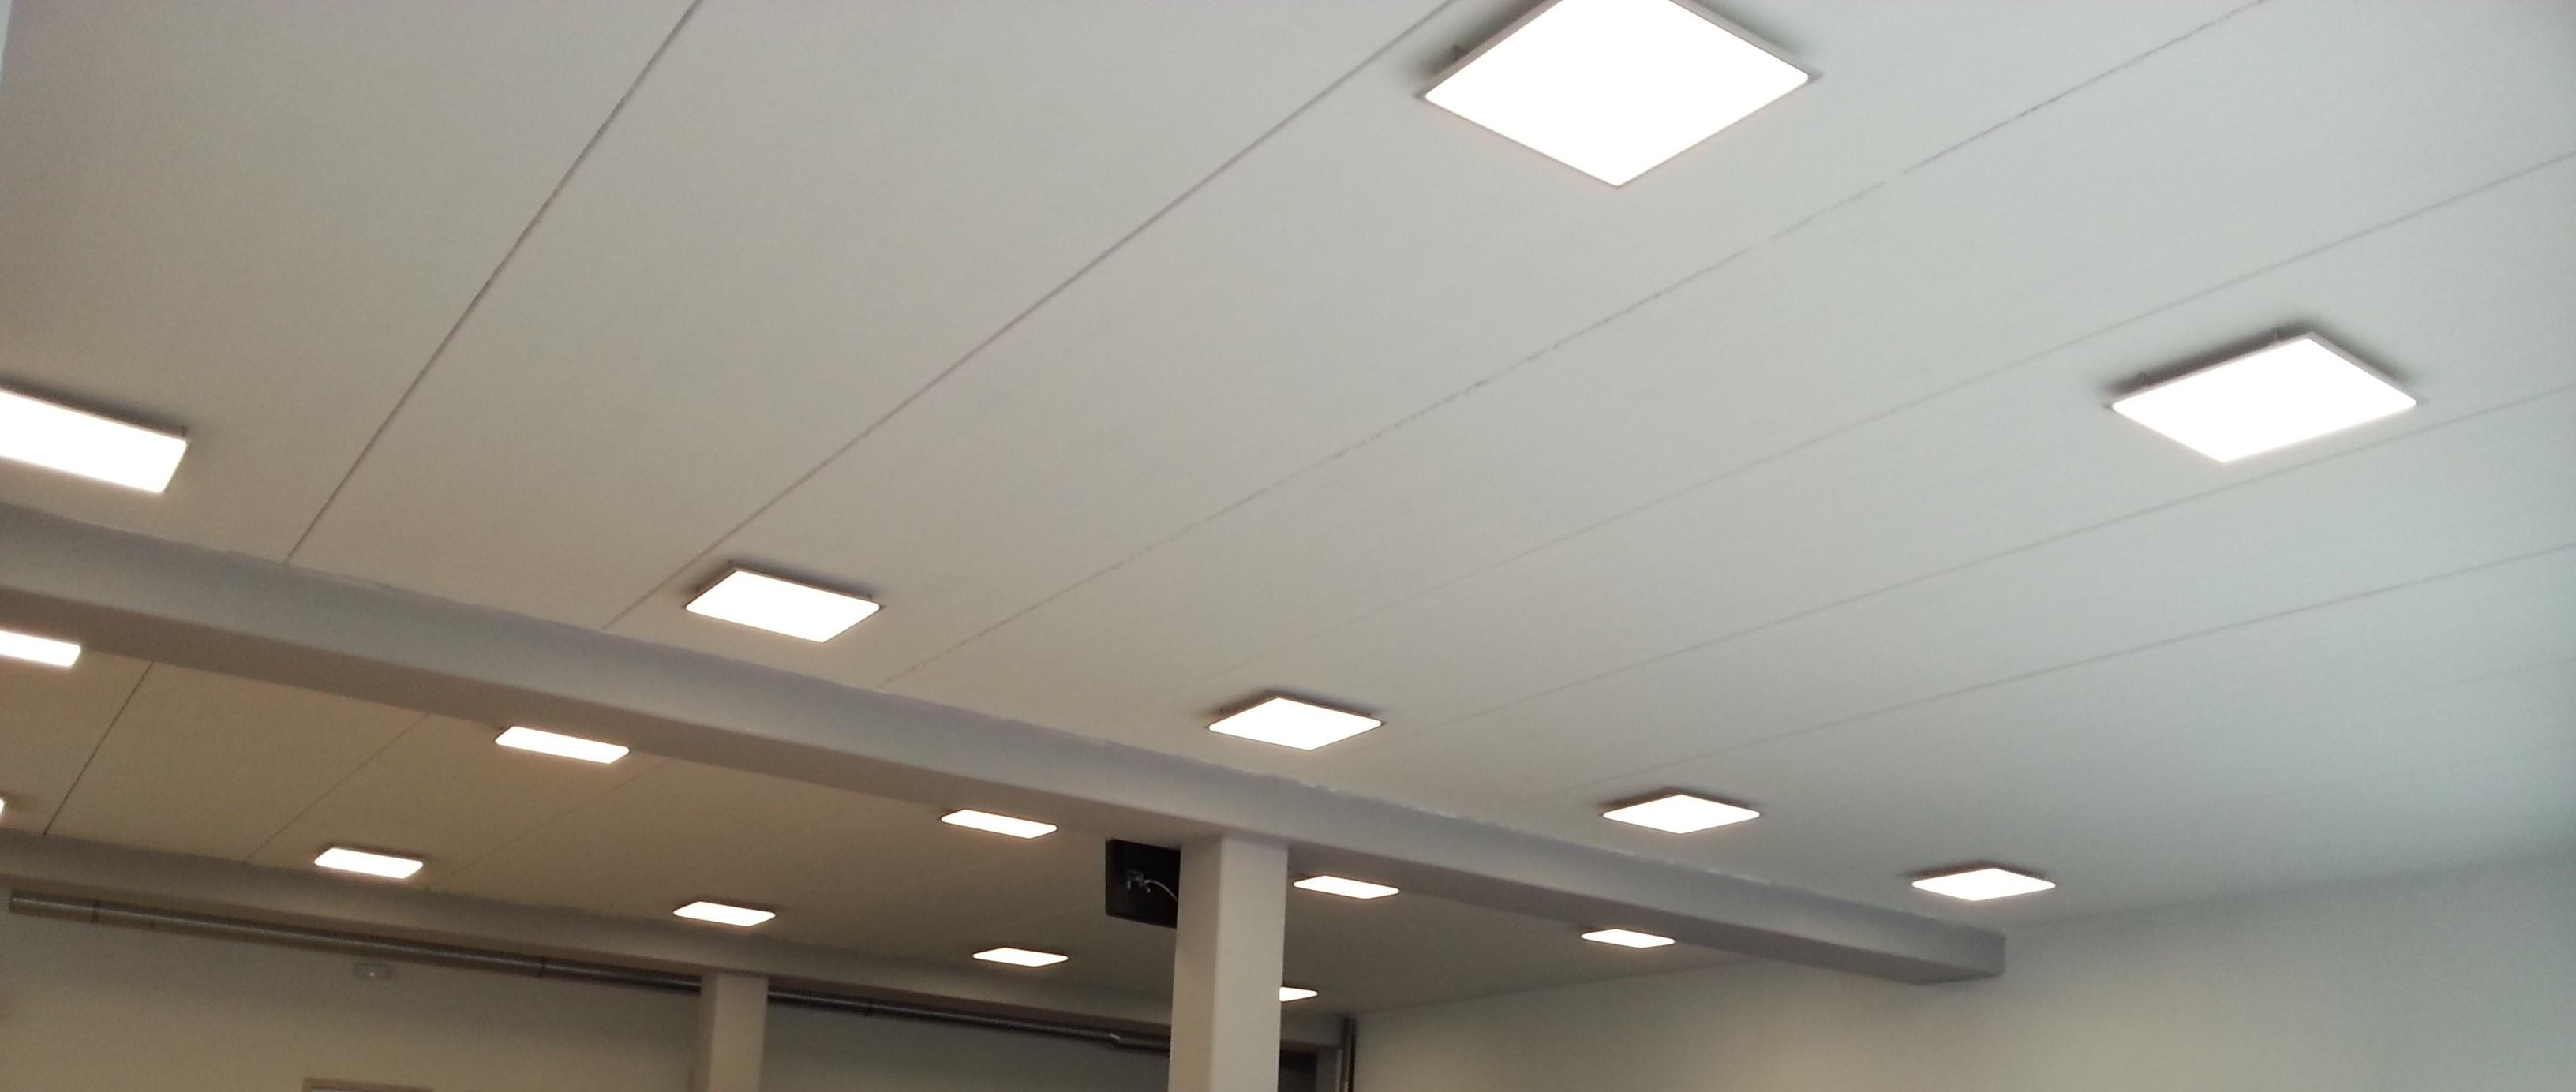 LED-osvetleni_fitness_projektova_dokumentace_navrh_led_osvetleni_praha_toplux